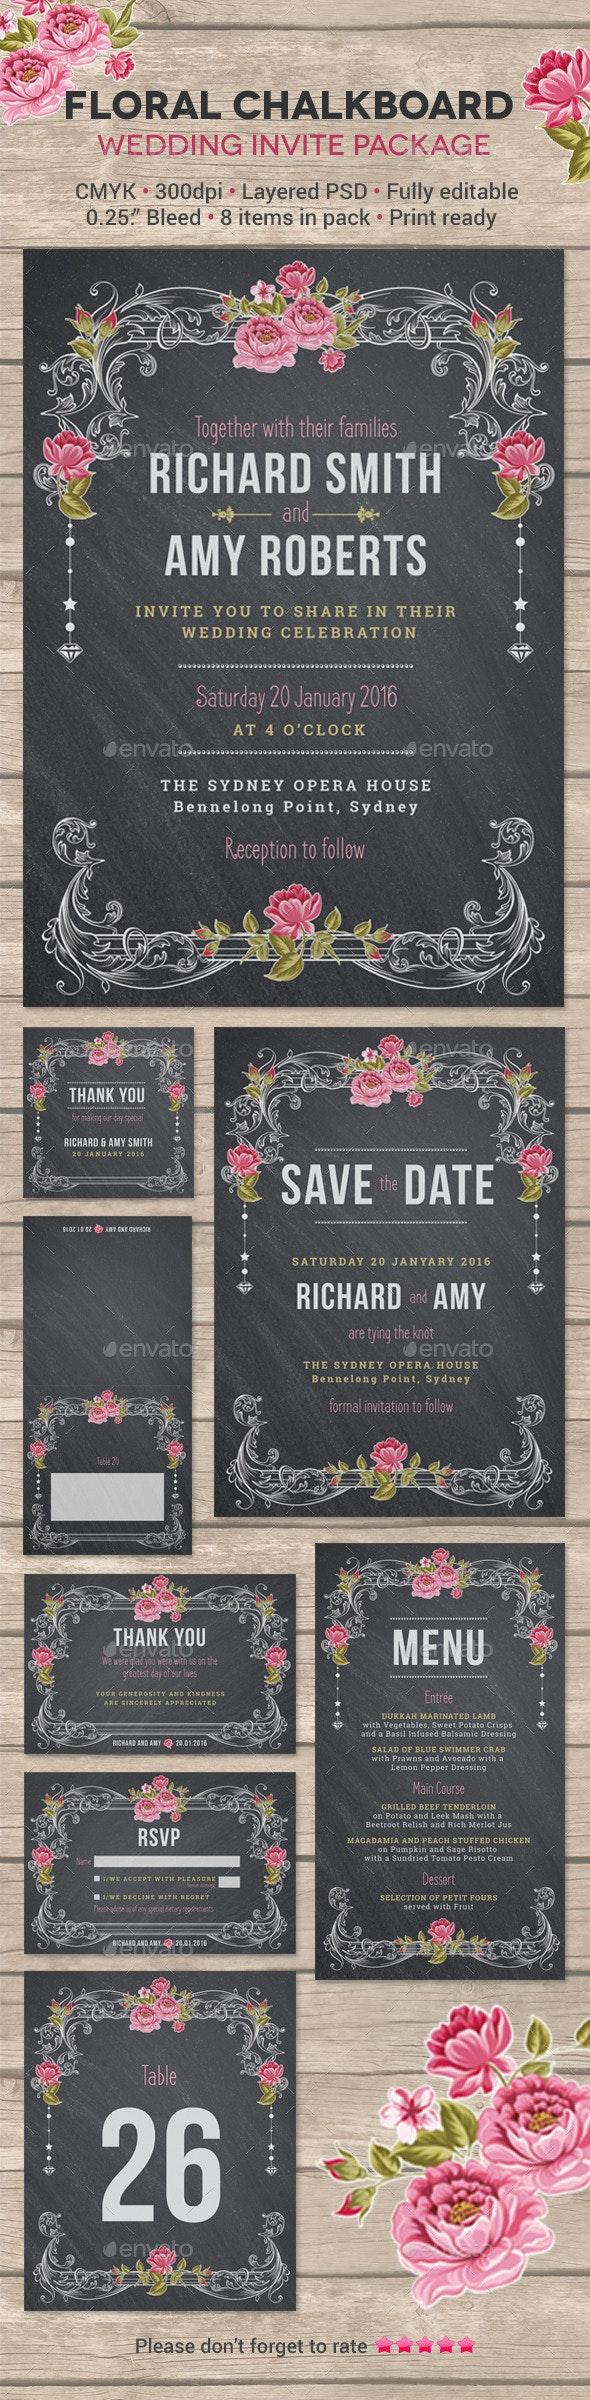 Floral Chalkboard Wedding Invite Package - Weddings Cards & Invites